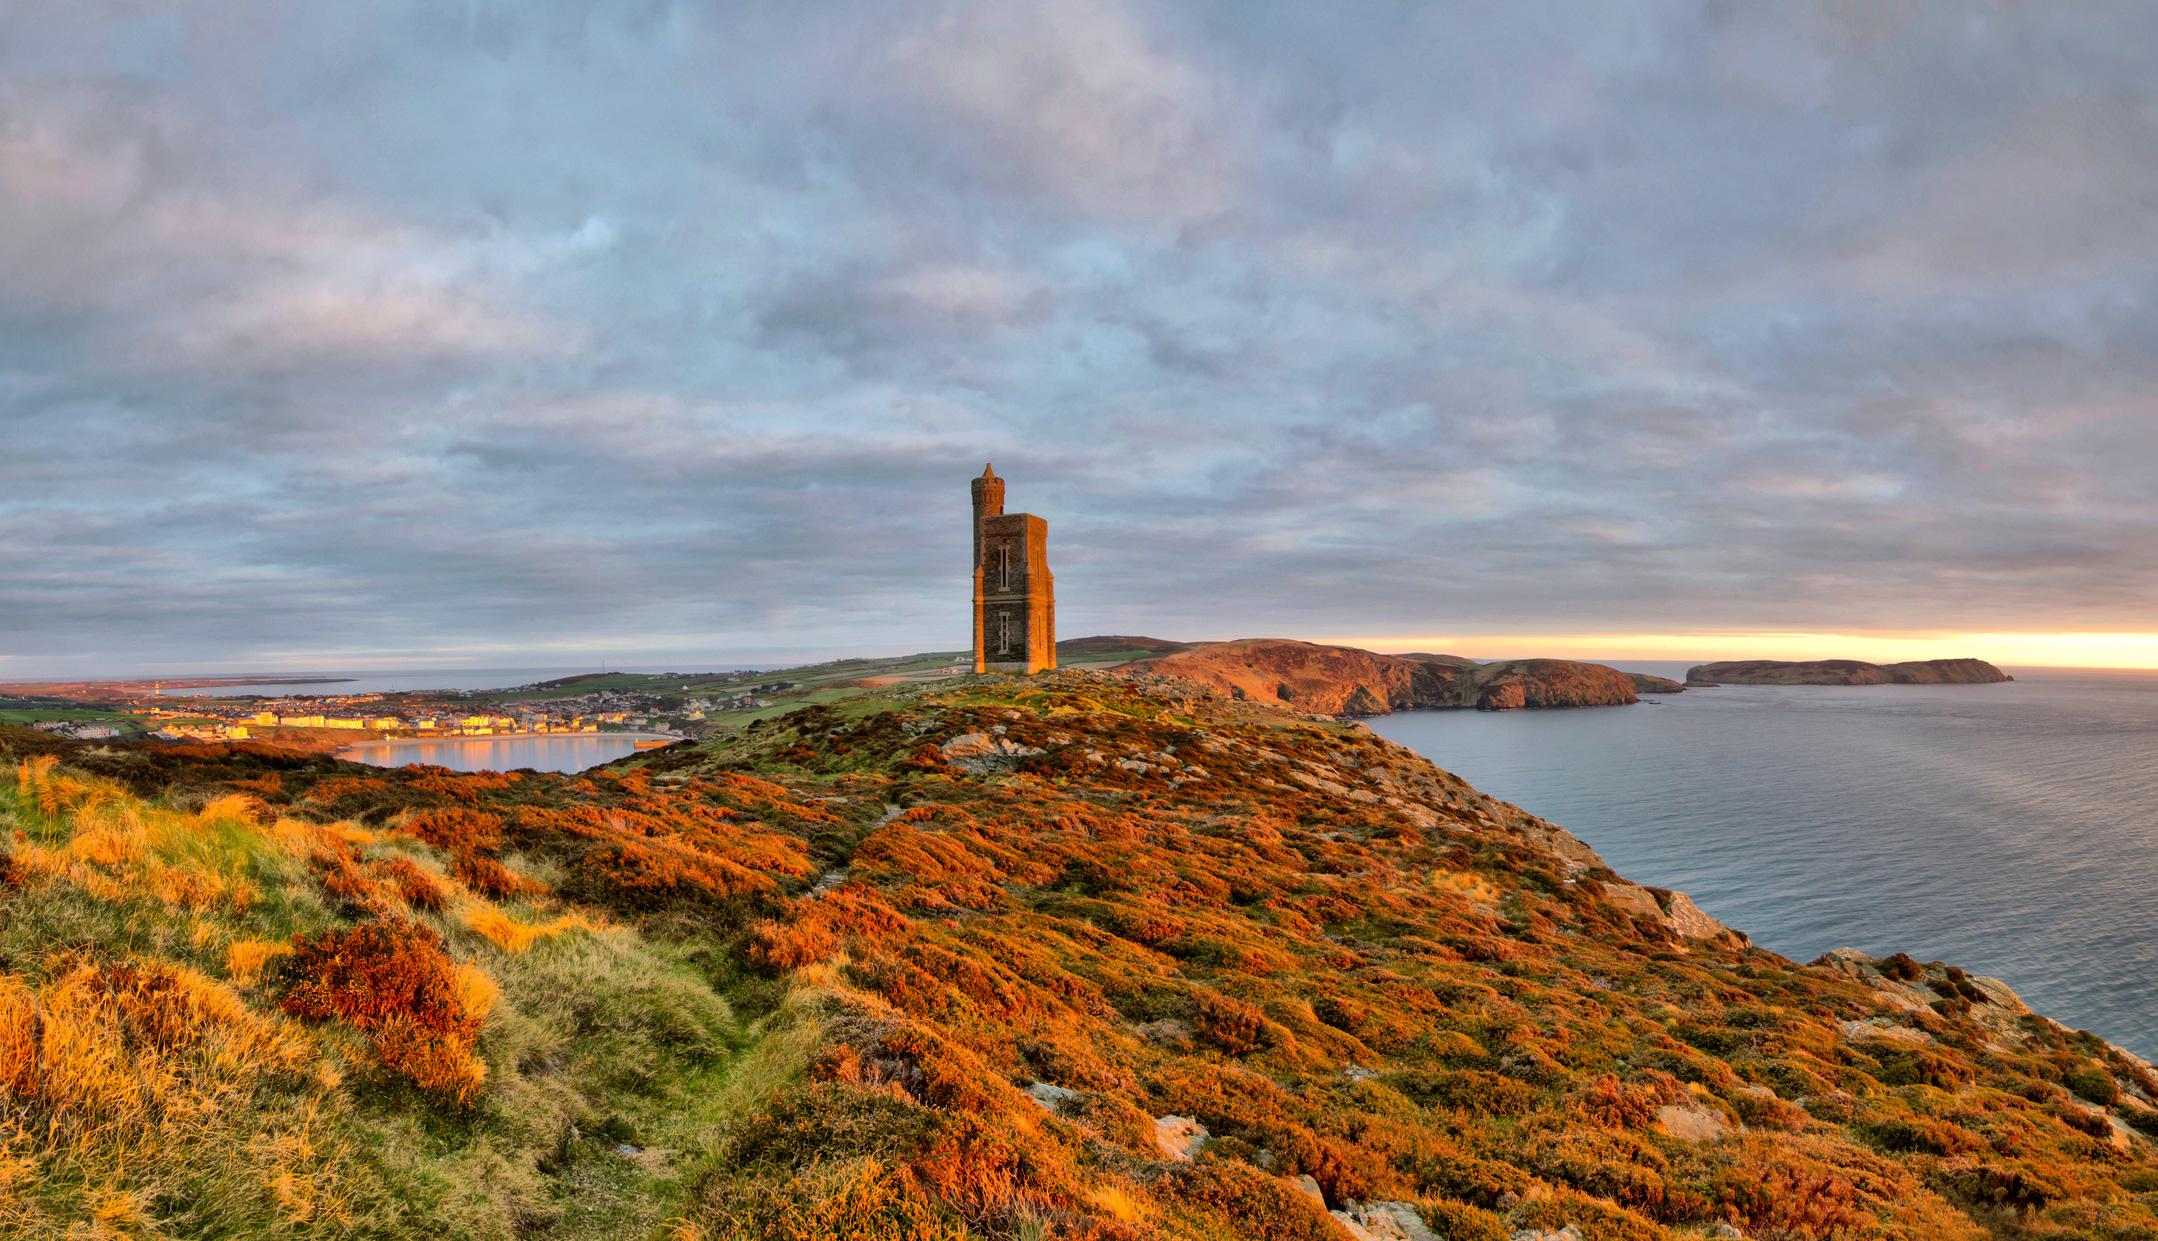 The Milner Tower on the Isle of Man Coastal Path